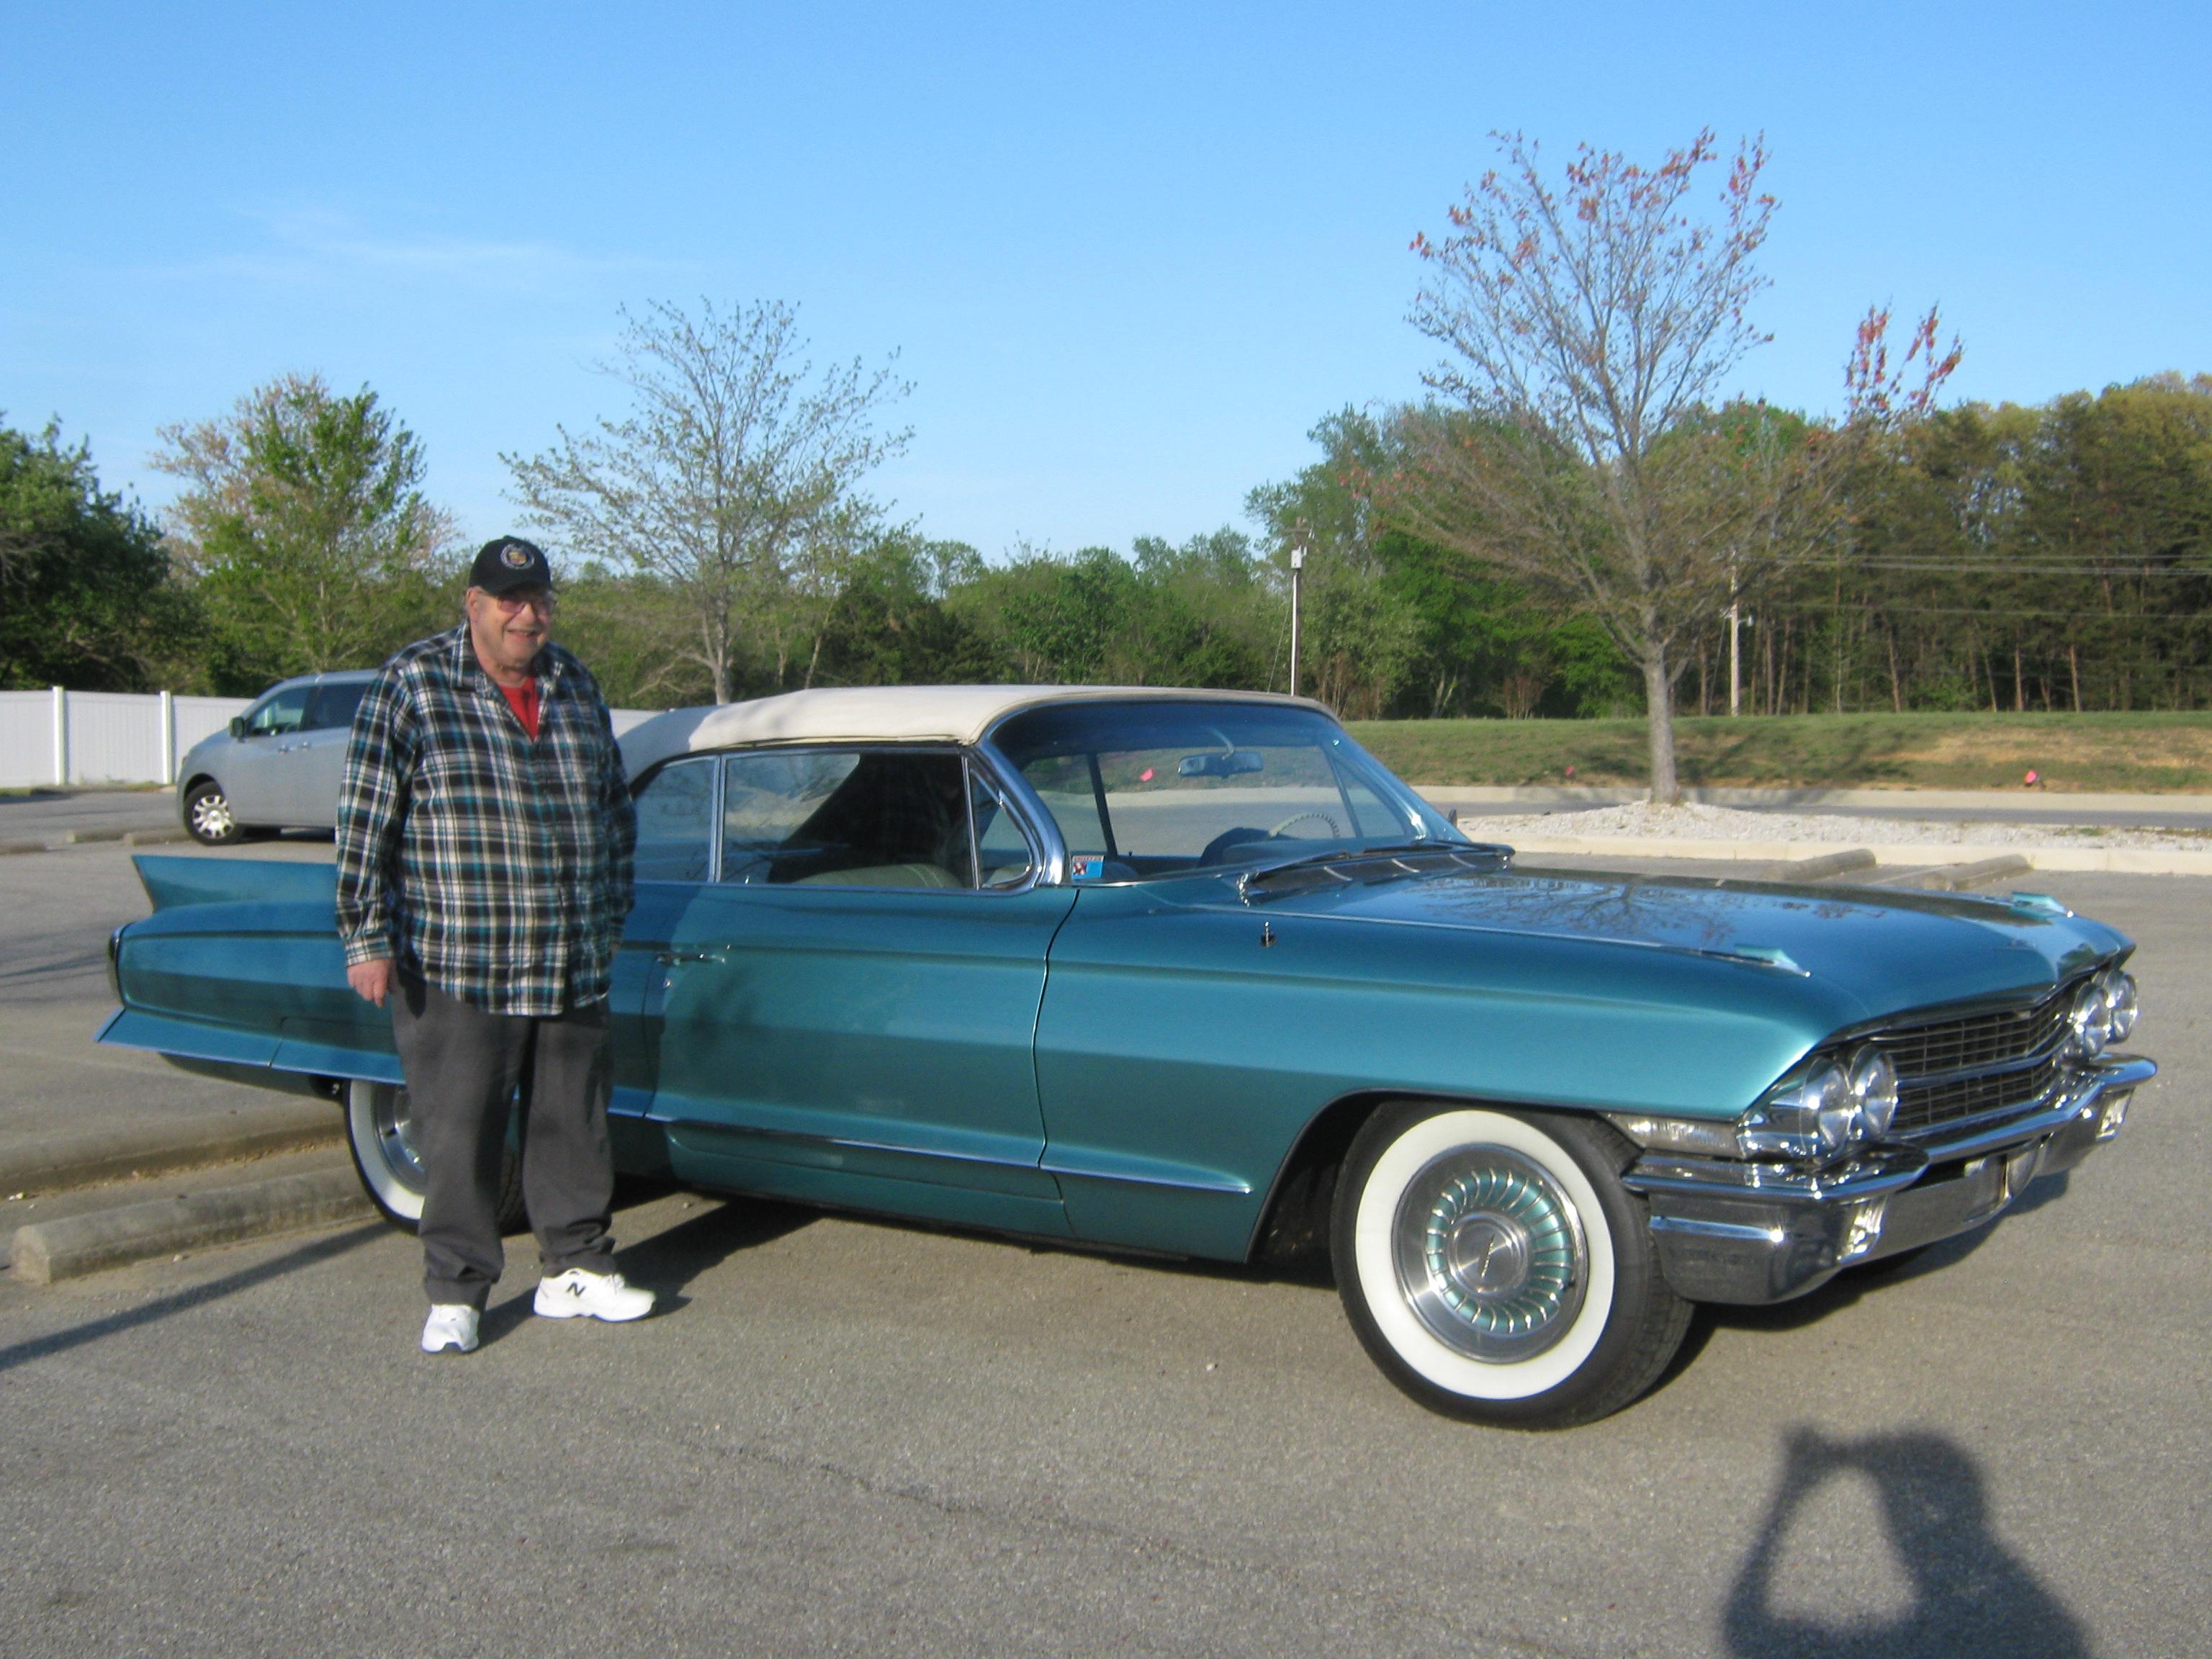 2017 Ron Weaver - '62 Cadillac